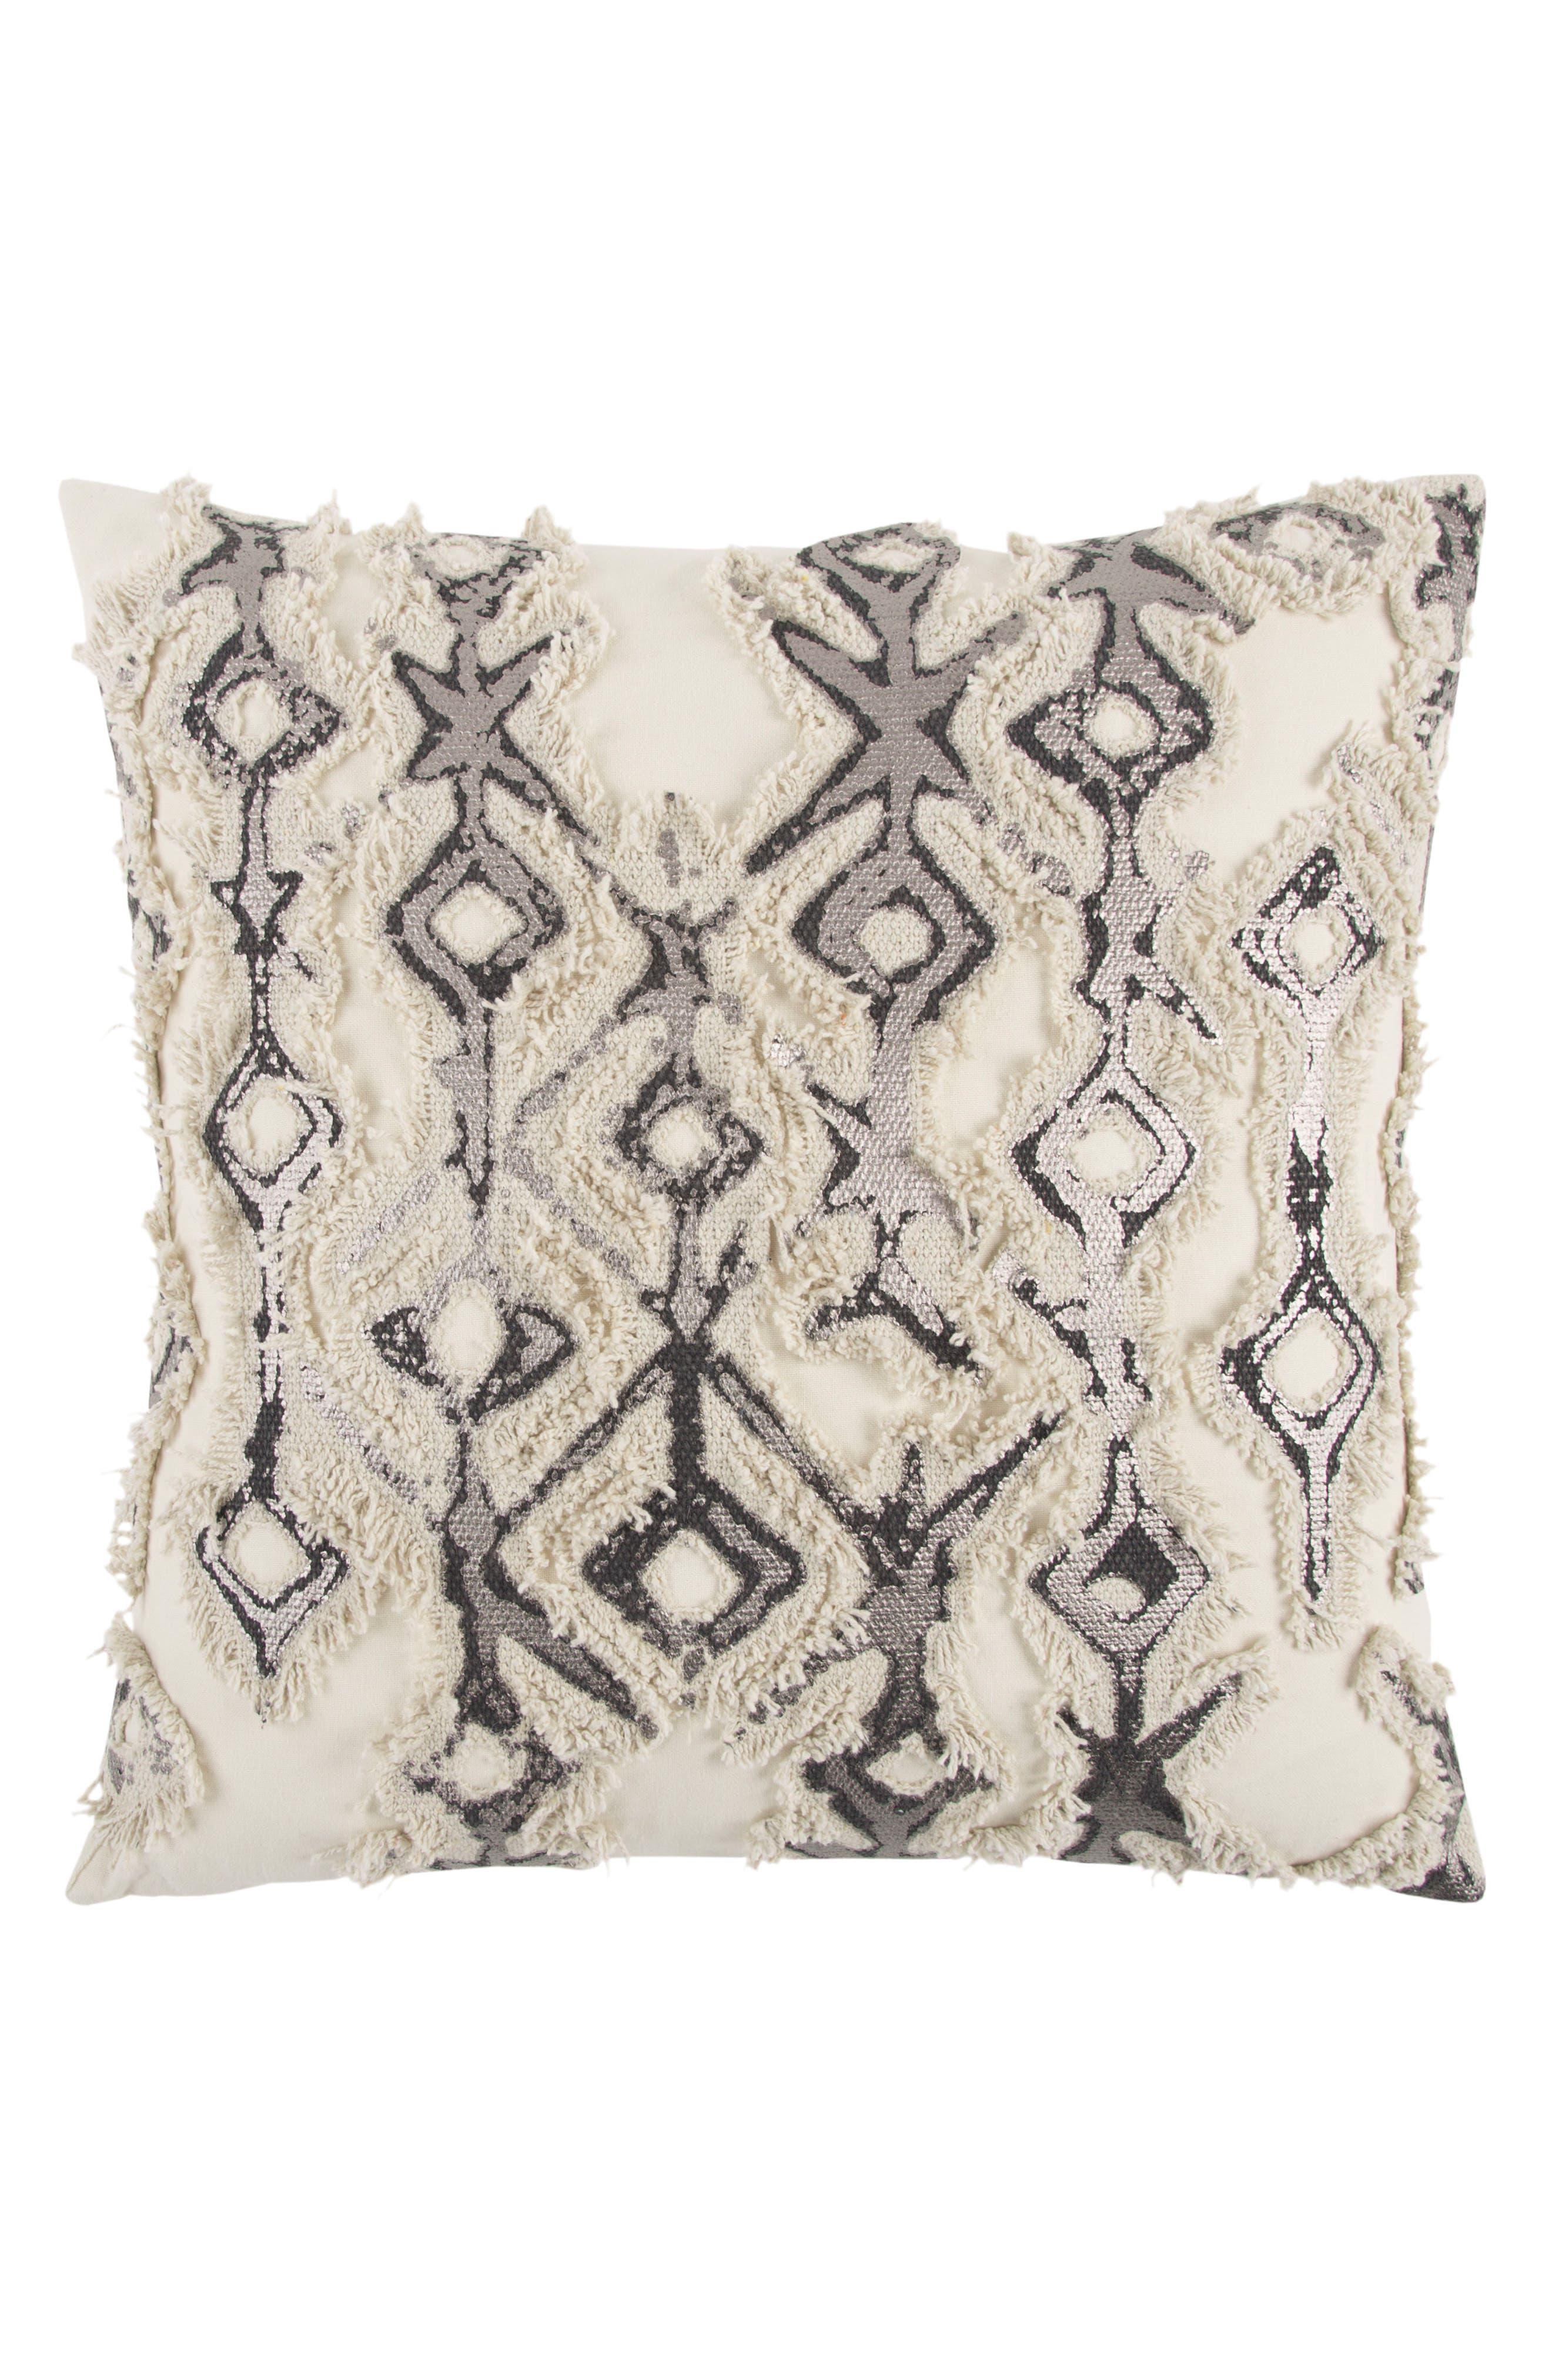 Geometric Pillow,                             Main thumbnail 1, color,                             020